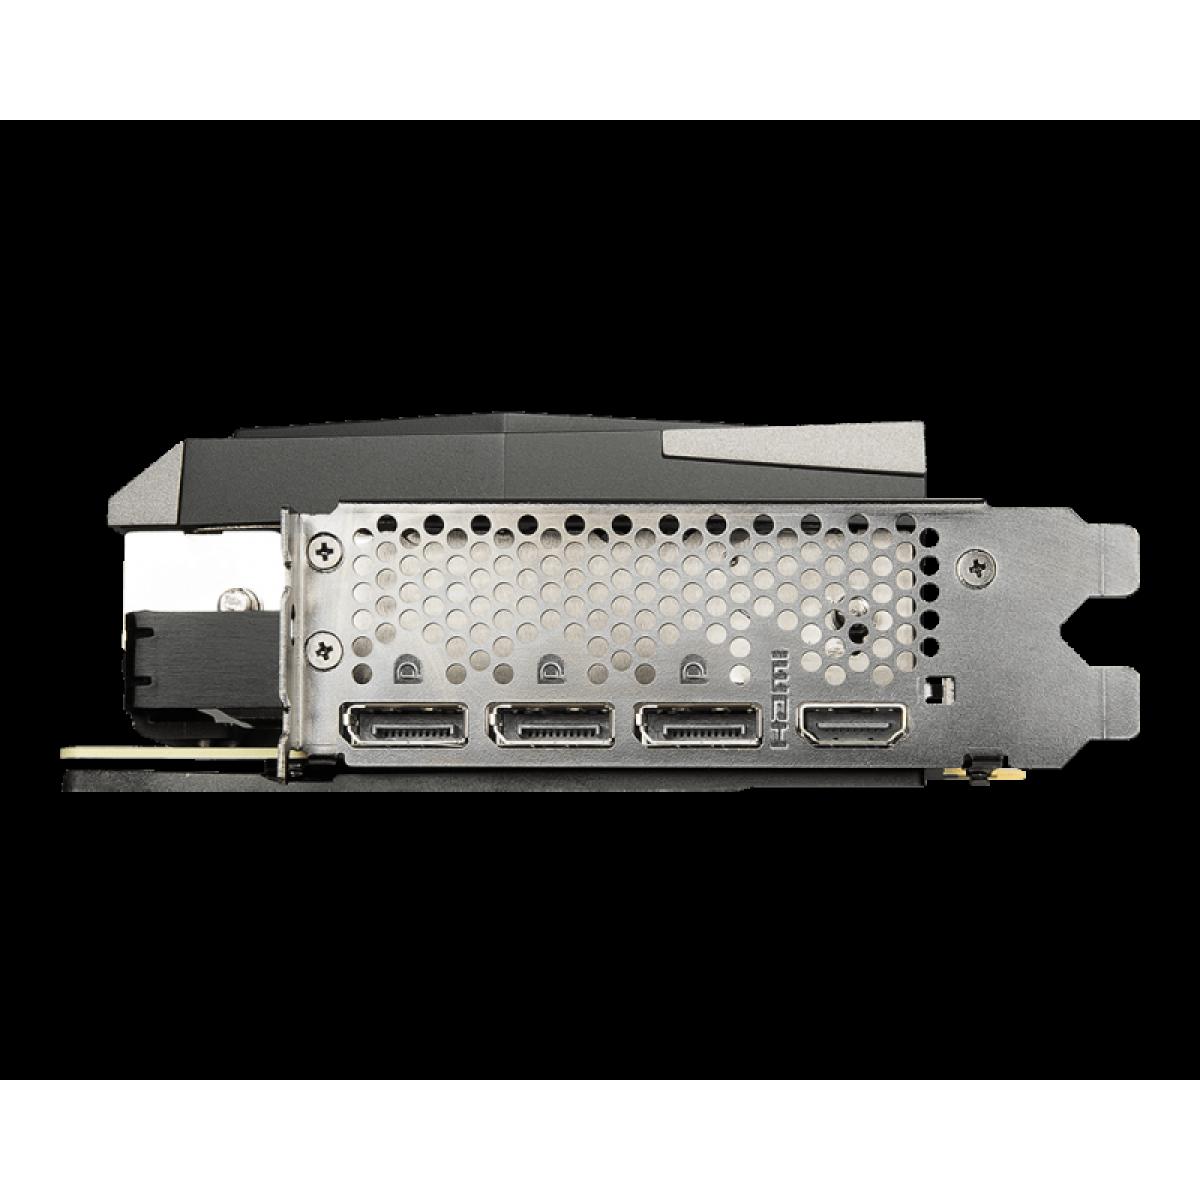 Placa de Vídeo MSI, GeForce, RTX 3080 Gaming X Trio, 10GB, GDDR6X, 320Bit